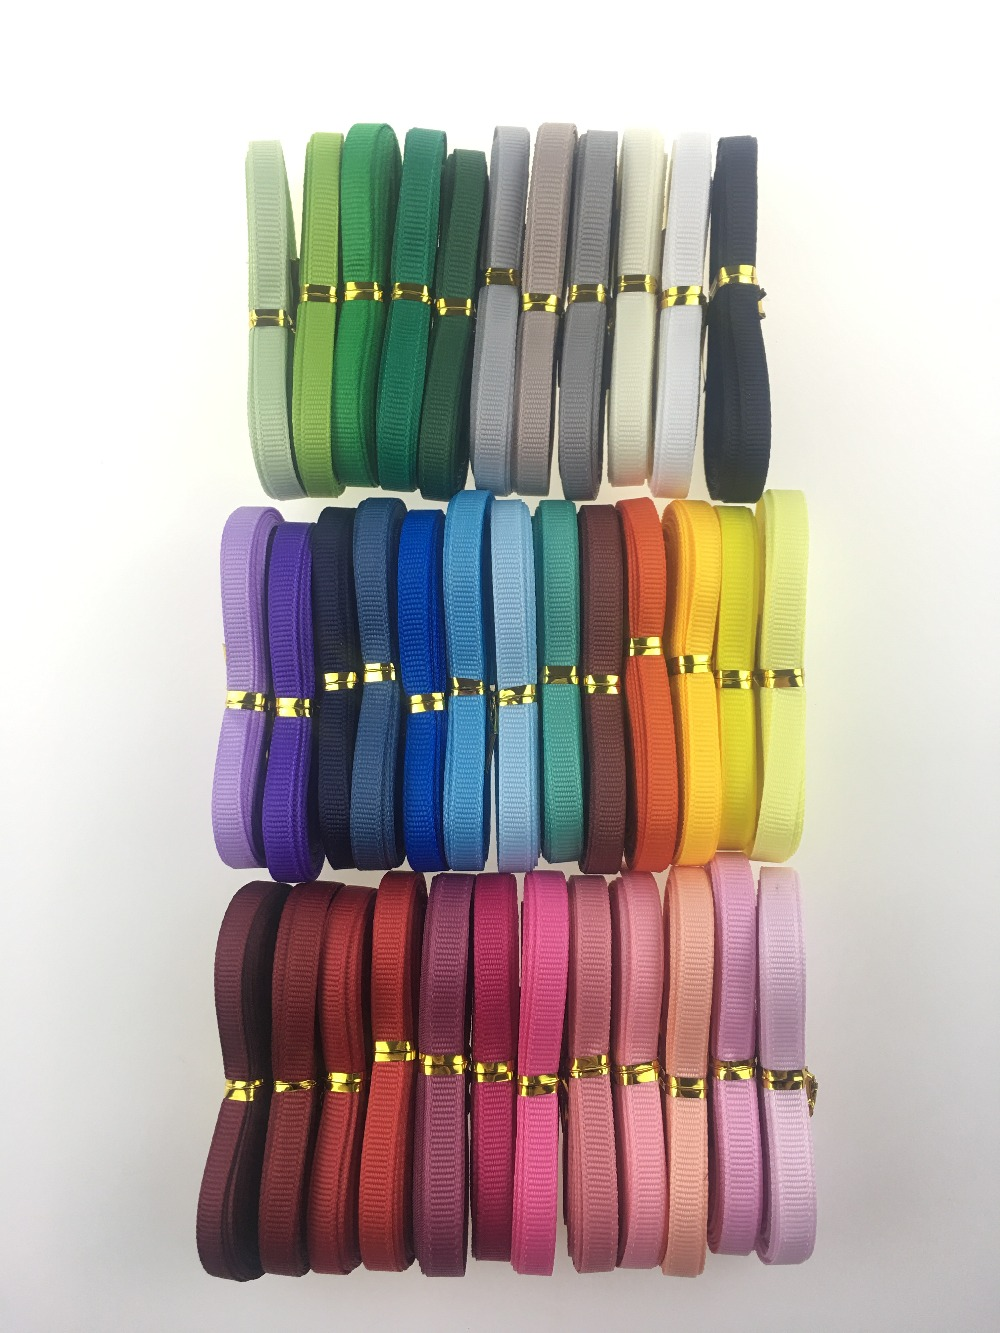 Polyester Plain Grosgrain Ribbons 6 10 15 25 38mm 5yards lot Satin Ribbon For gift wrap Polyester Plain Grosgrain Ribbons 6/10/15/25/38mm 5yards/lot Satin Ribbon For gift wrap DIY Hair Bow Wedding Party Decoration